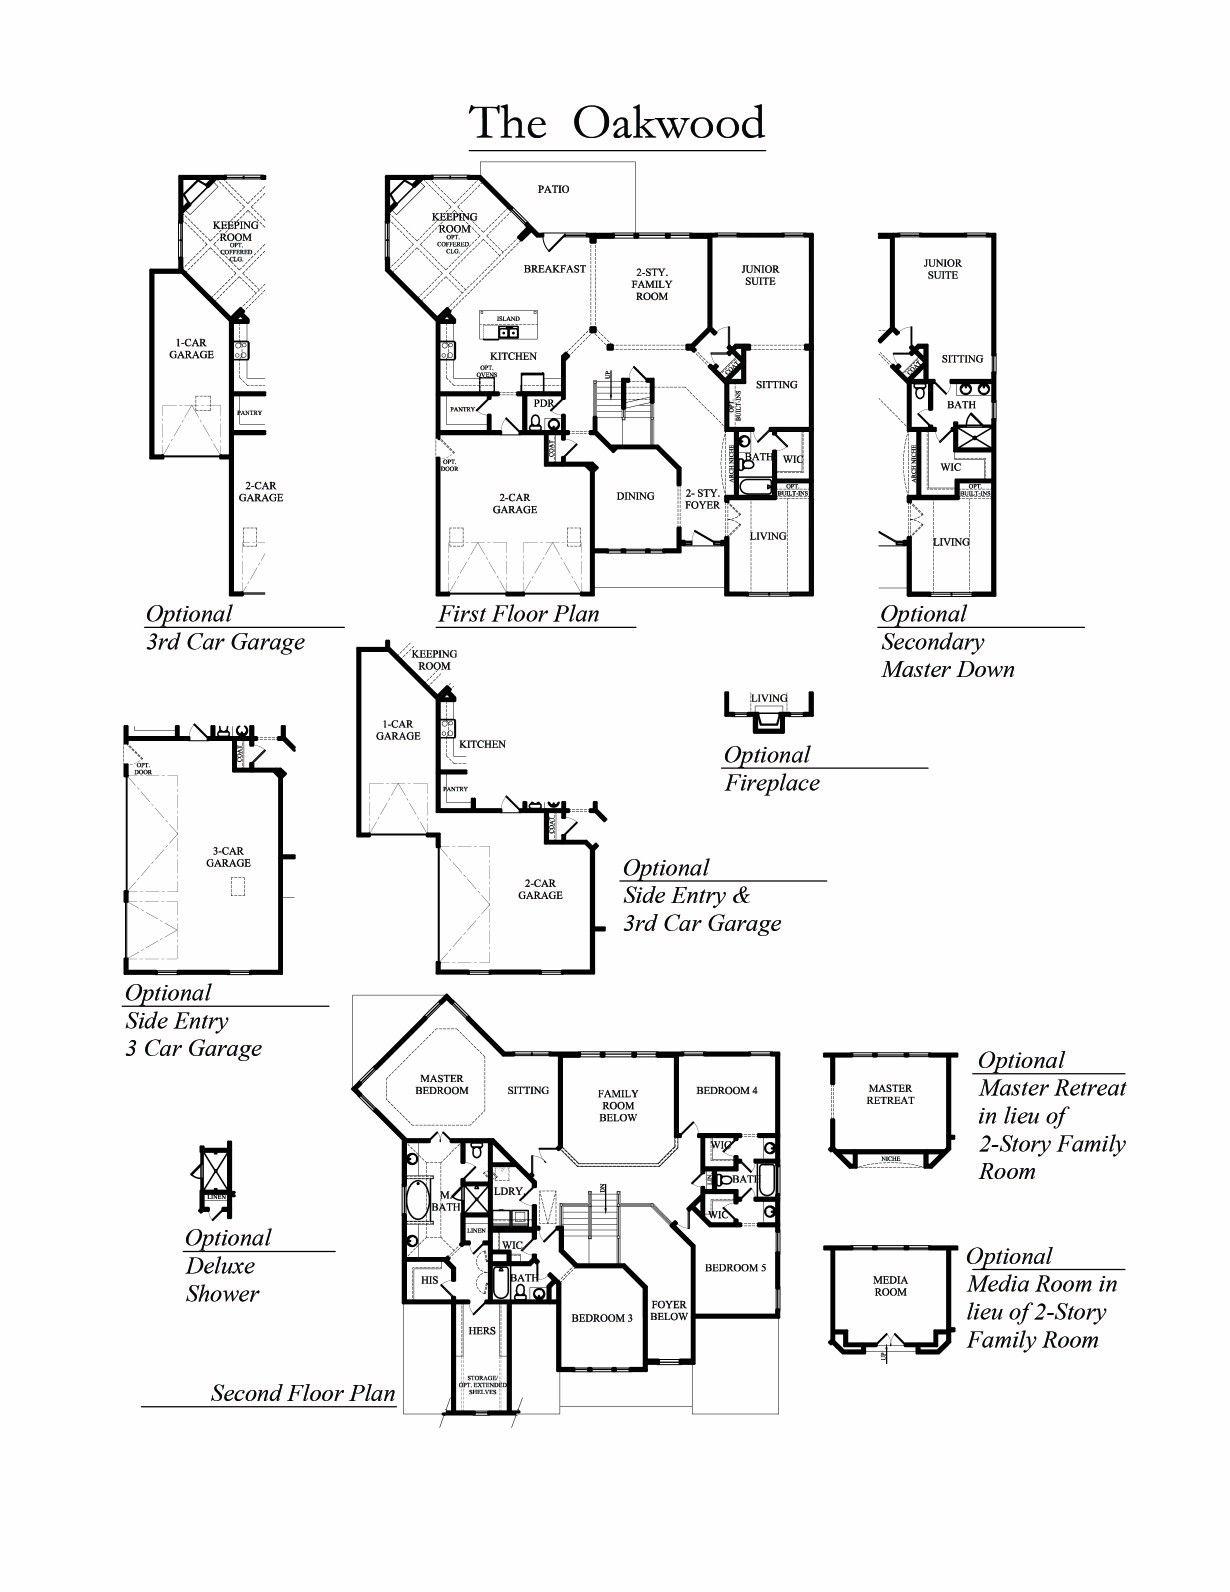 Dr Horton Oakwood Floor Plans House Plans How To Plan